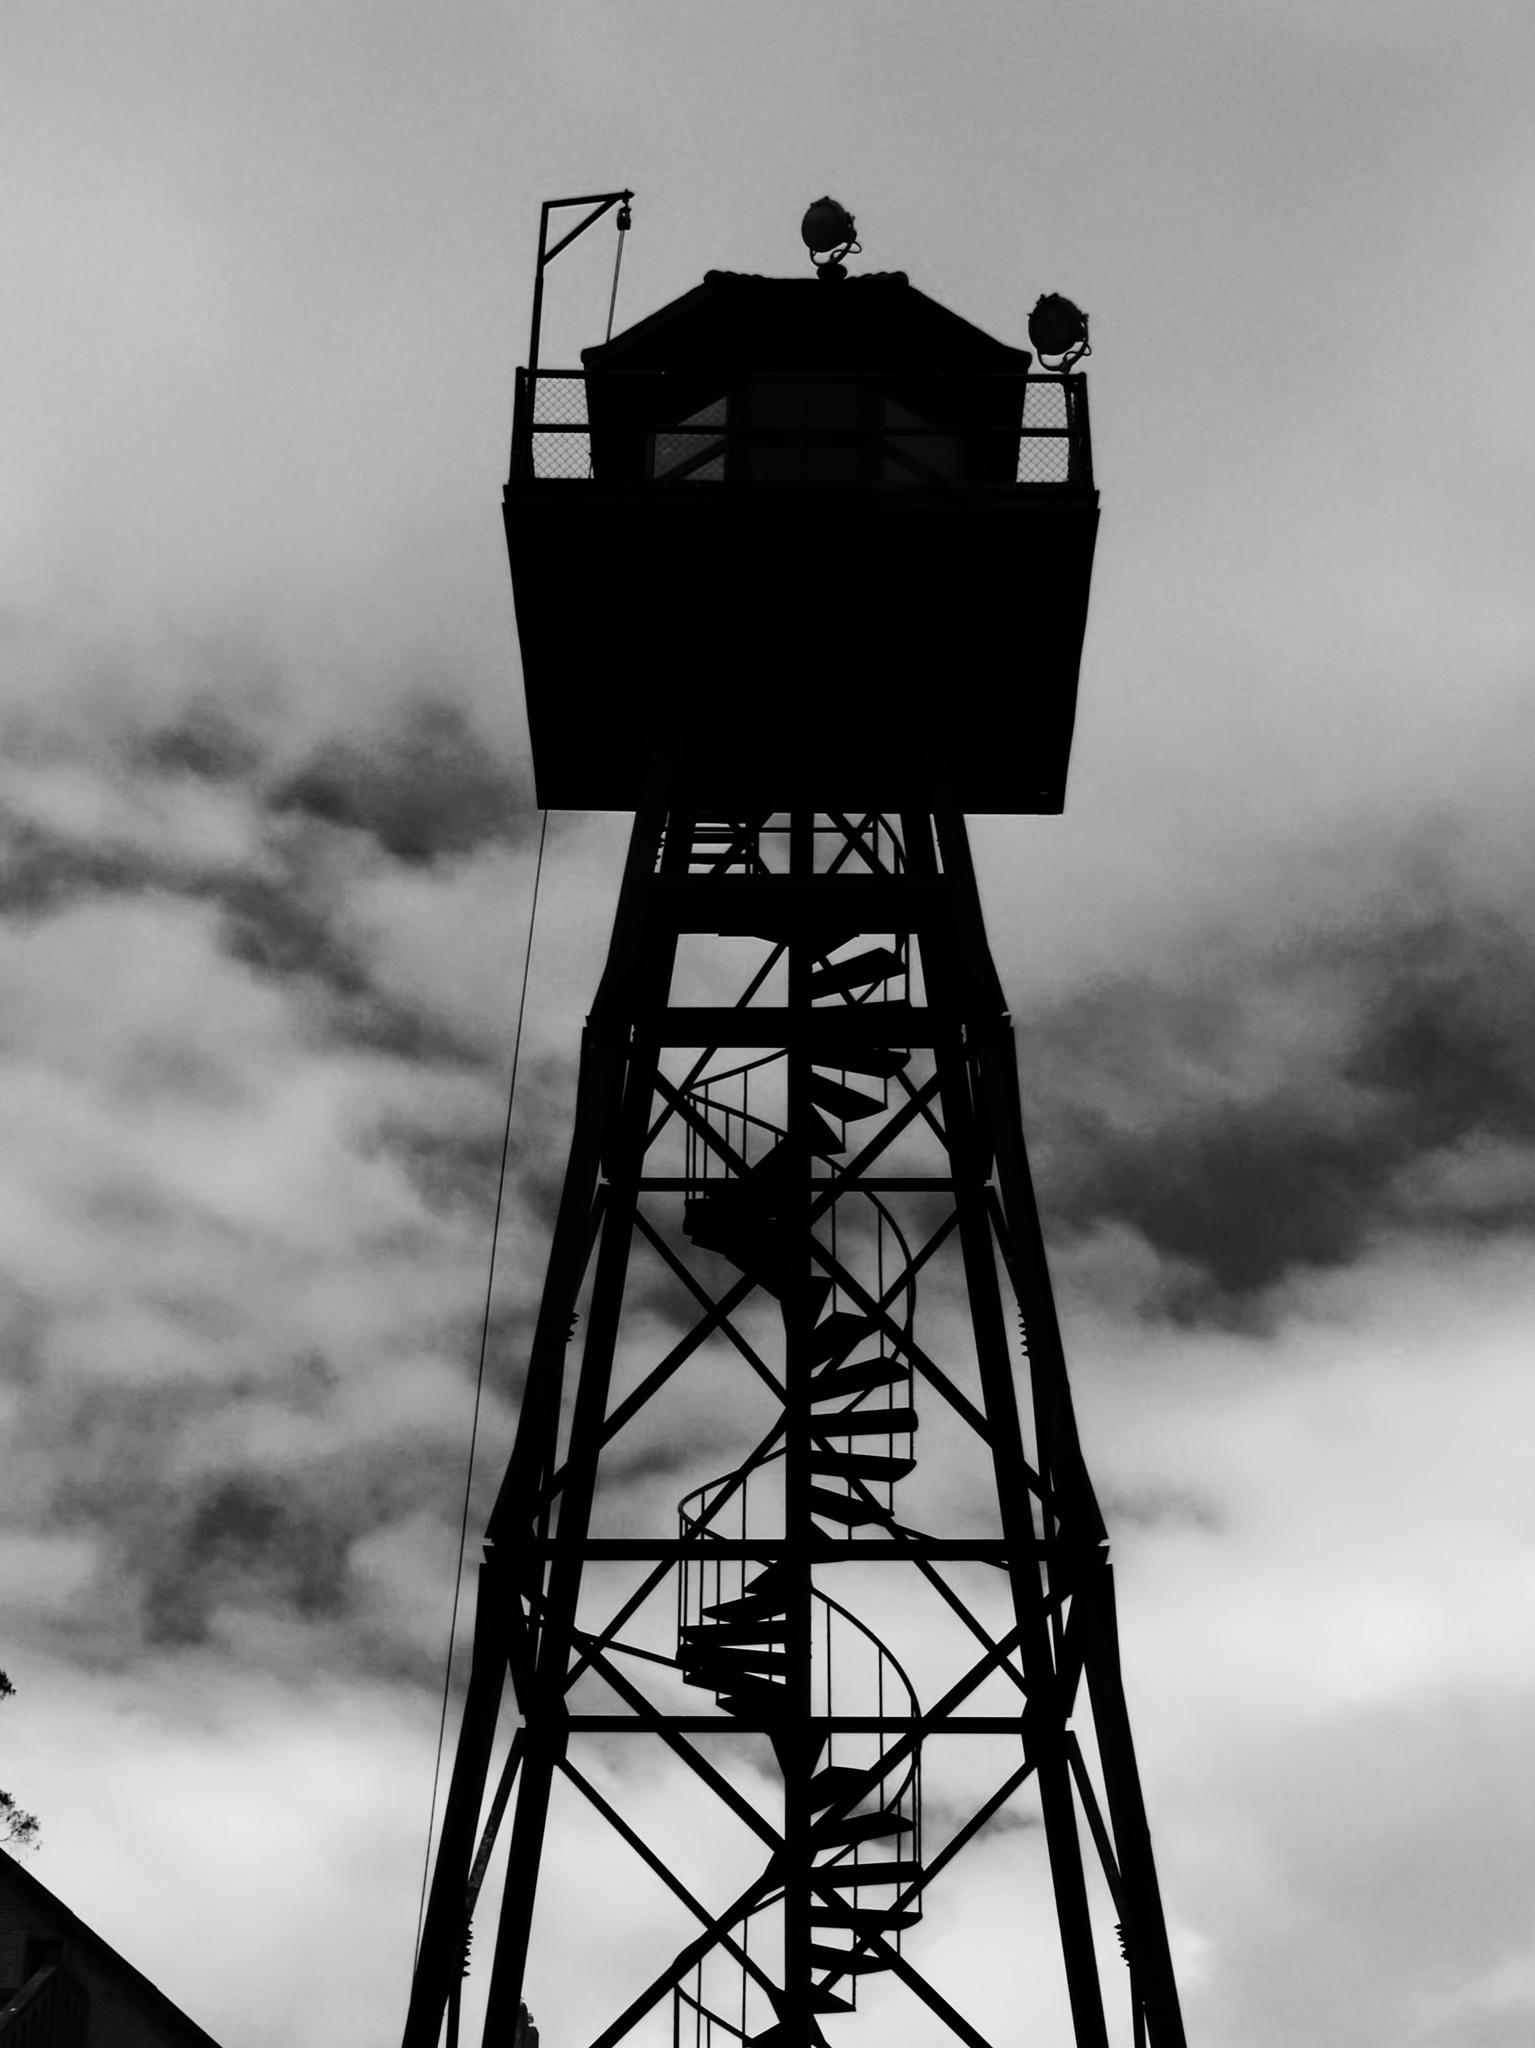 The Tower by Jody Davis